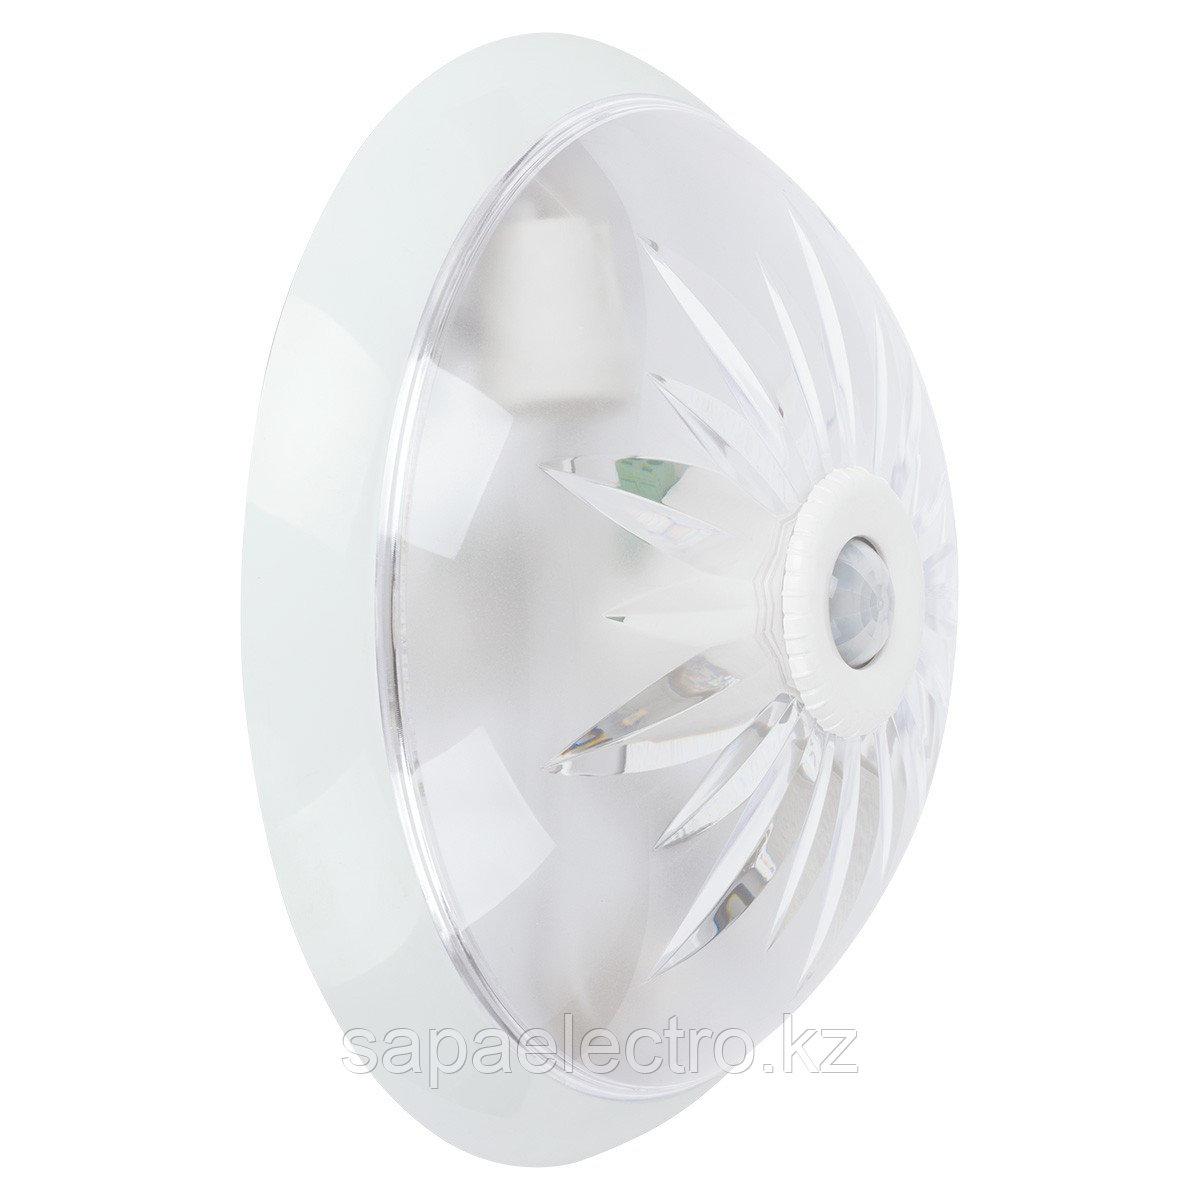 Св-к SMART SENSOR LED 18W 6000K 265мм  MGL (12шт)